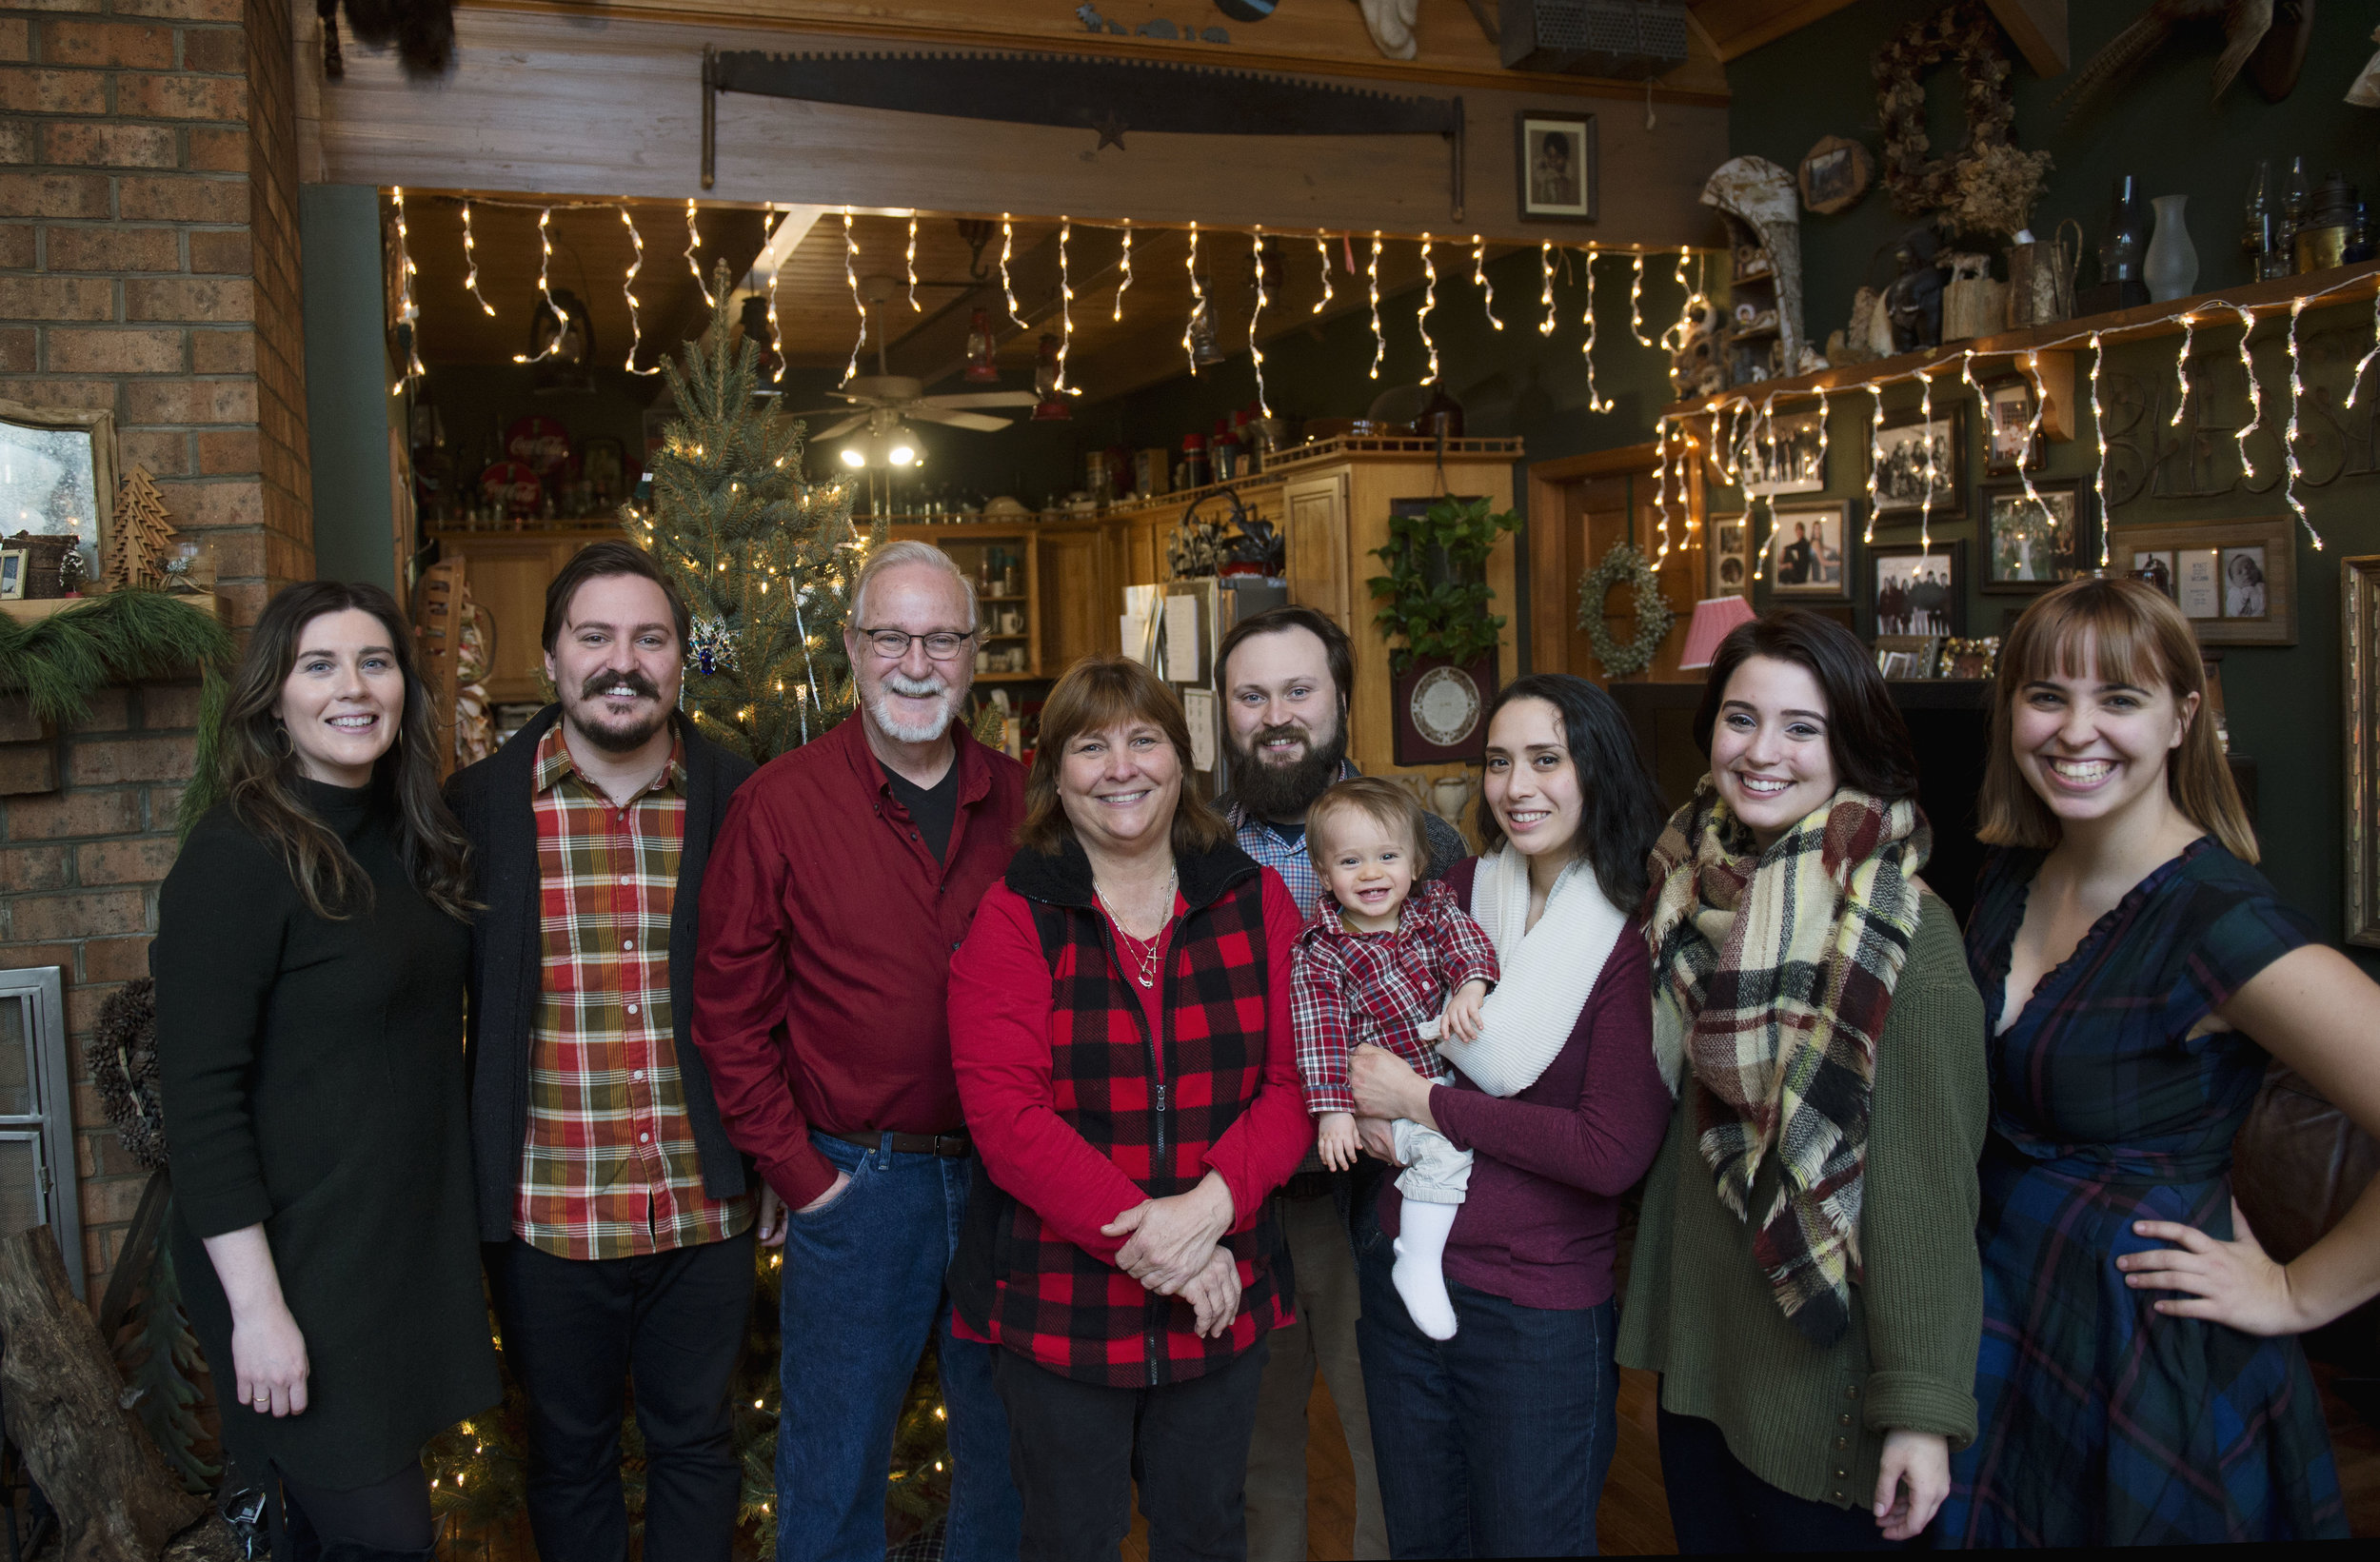 The McCann Family